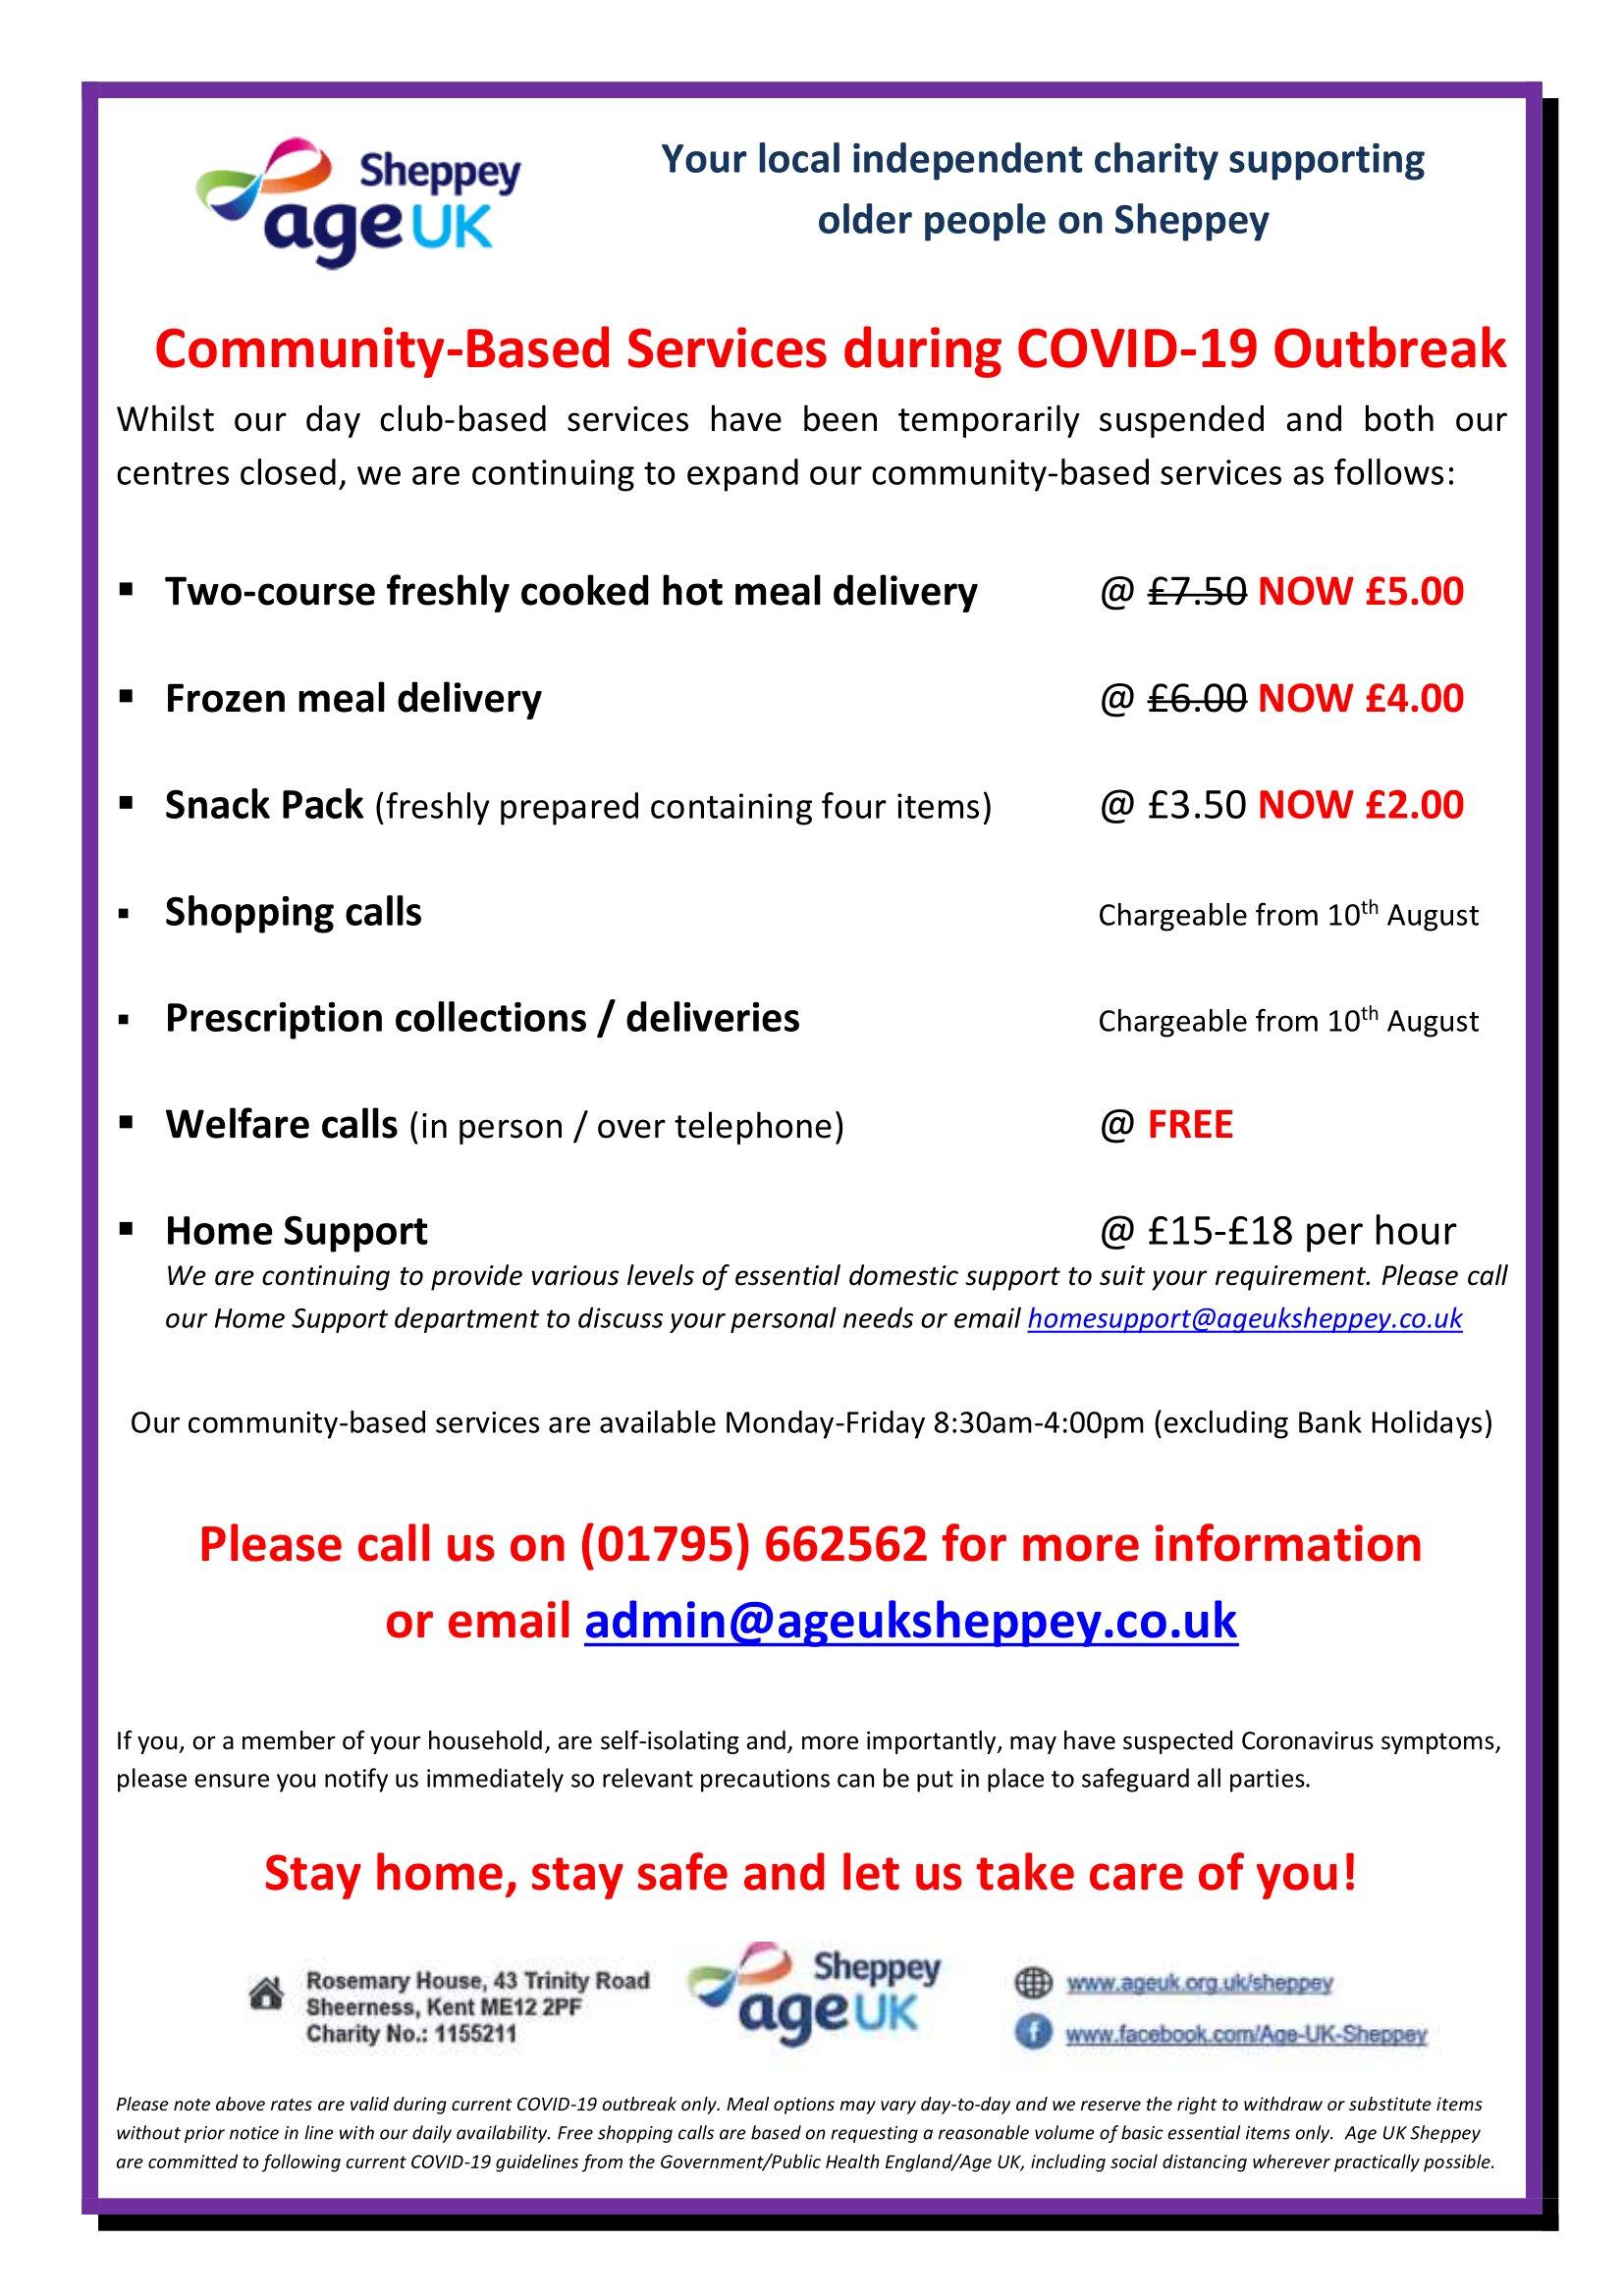 Covid 19 Community Services Price List